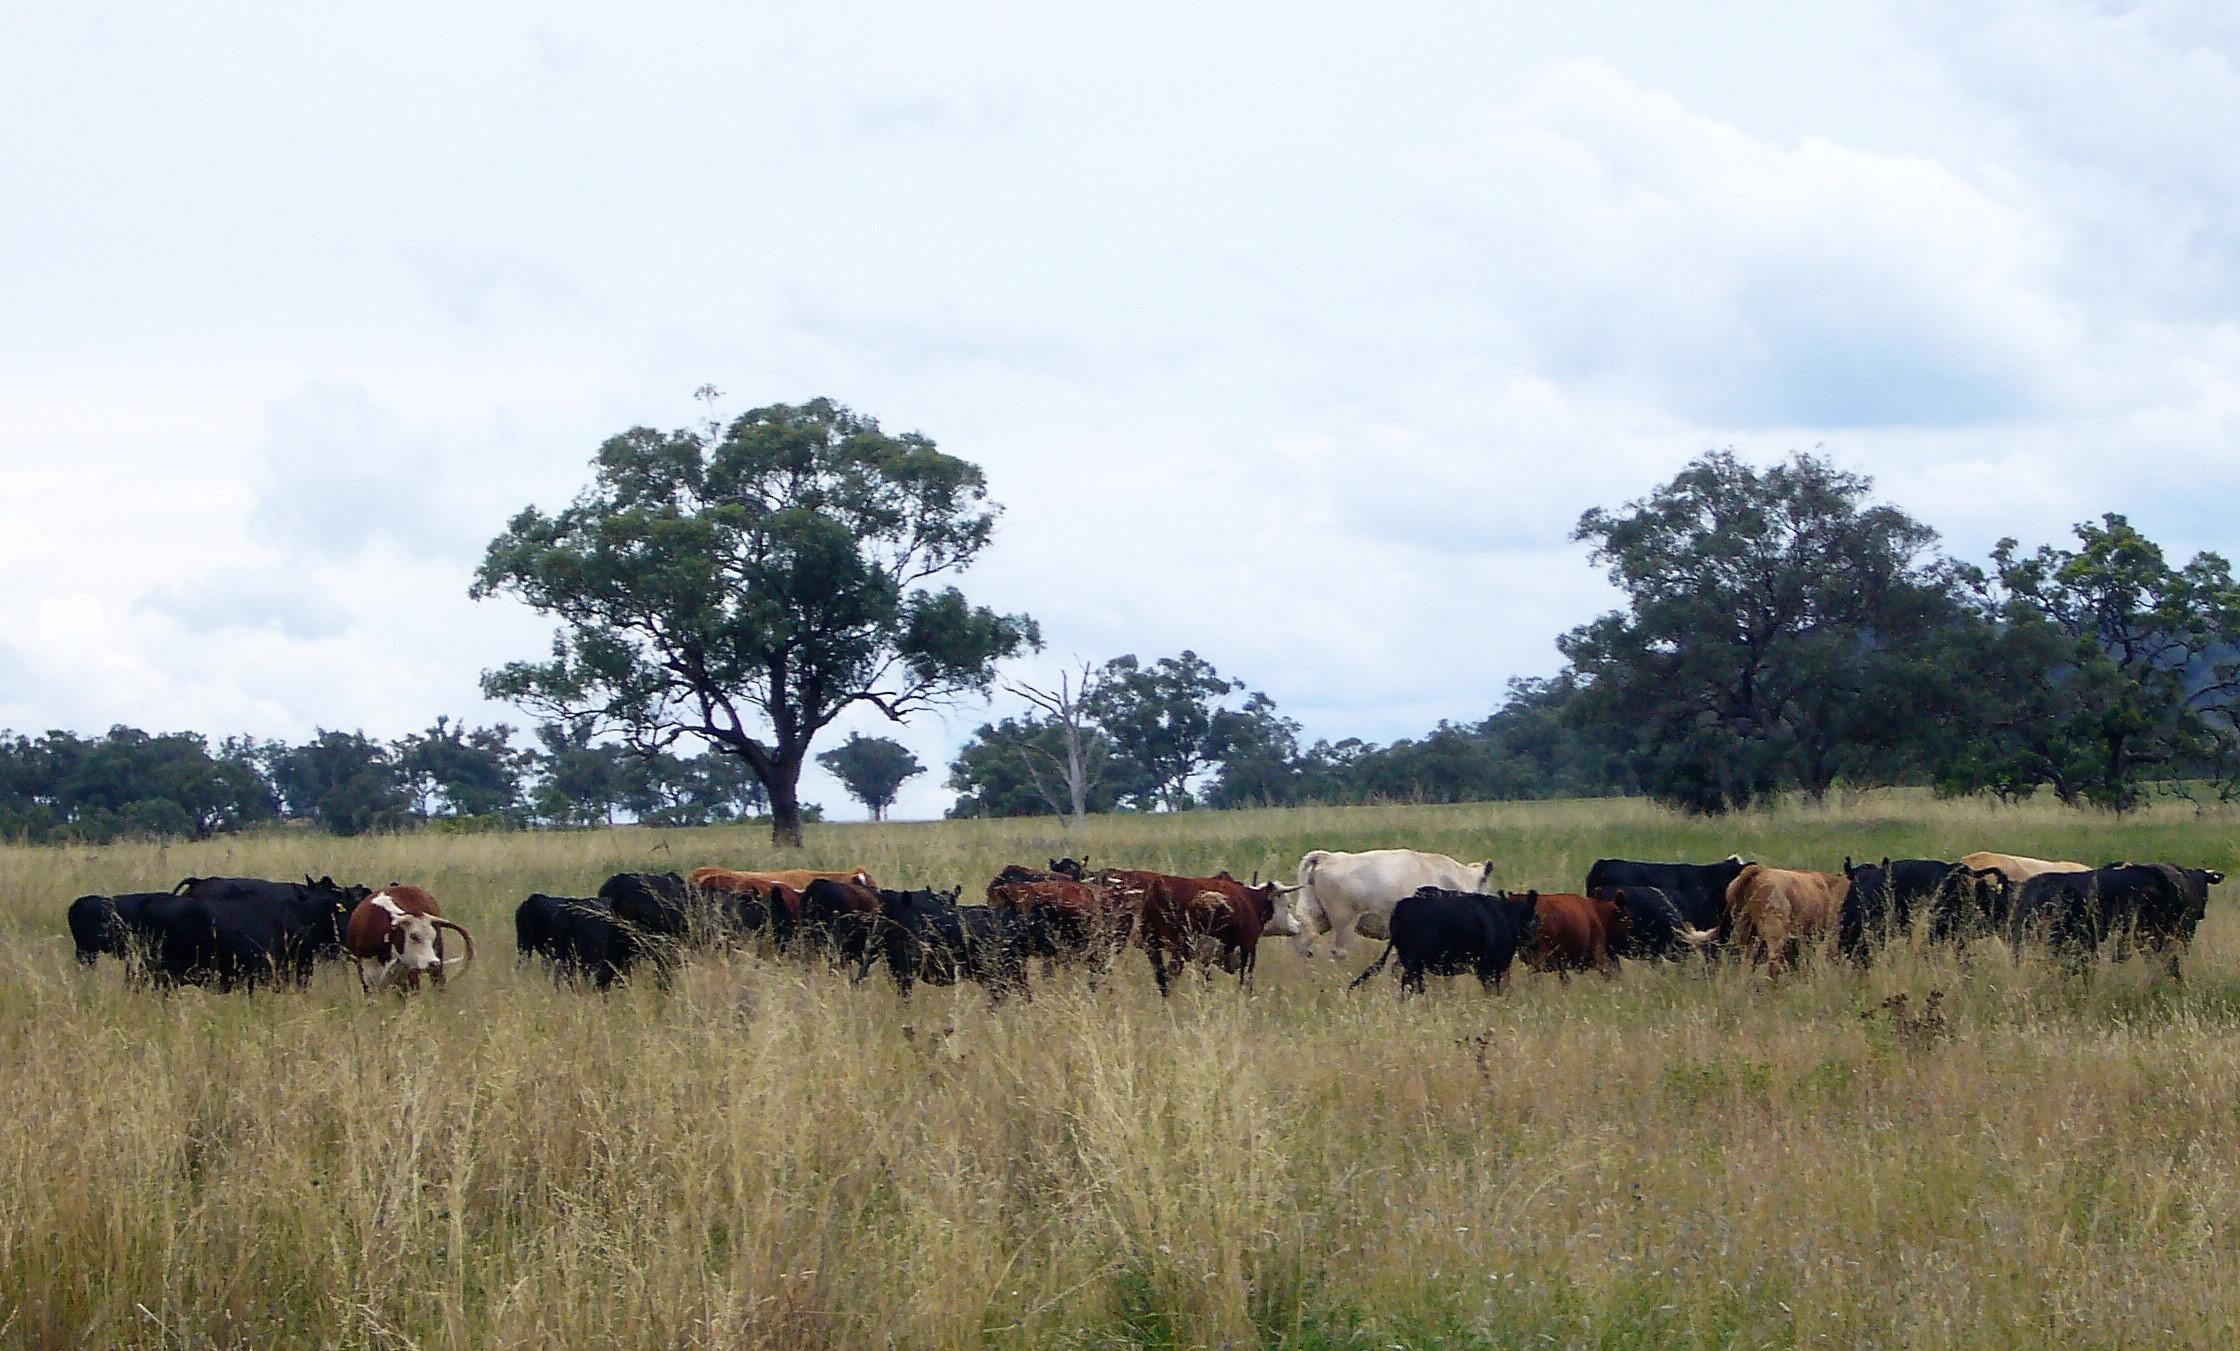 Visit My Farm Australia - Tallawang, Willow Tree NSW